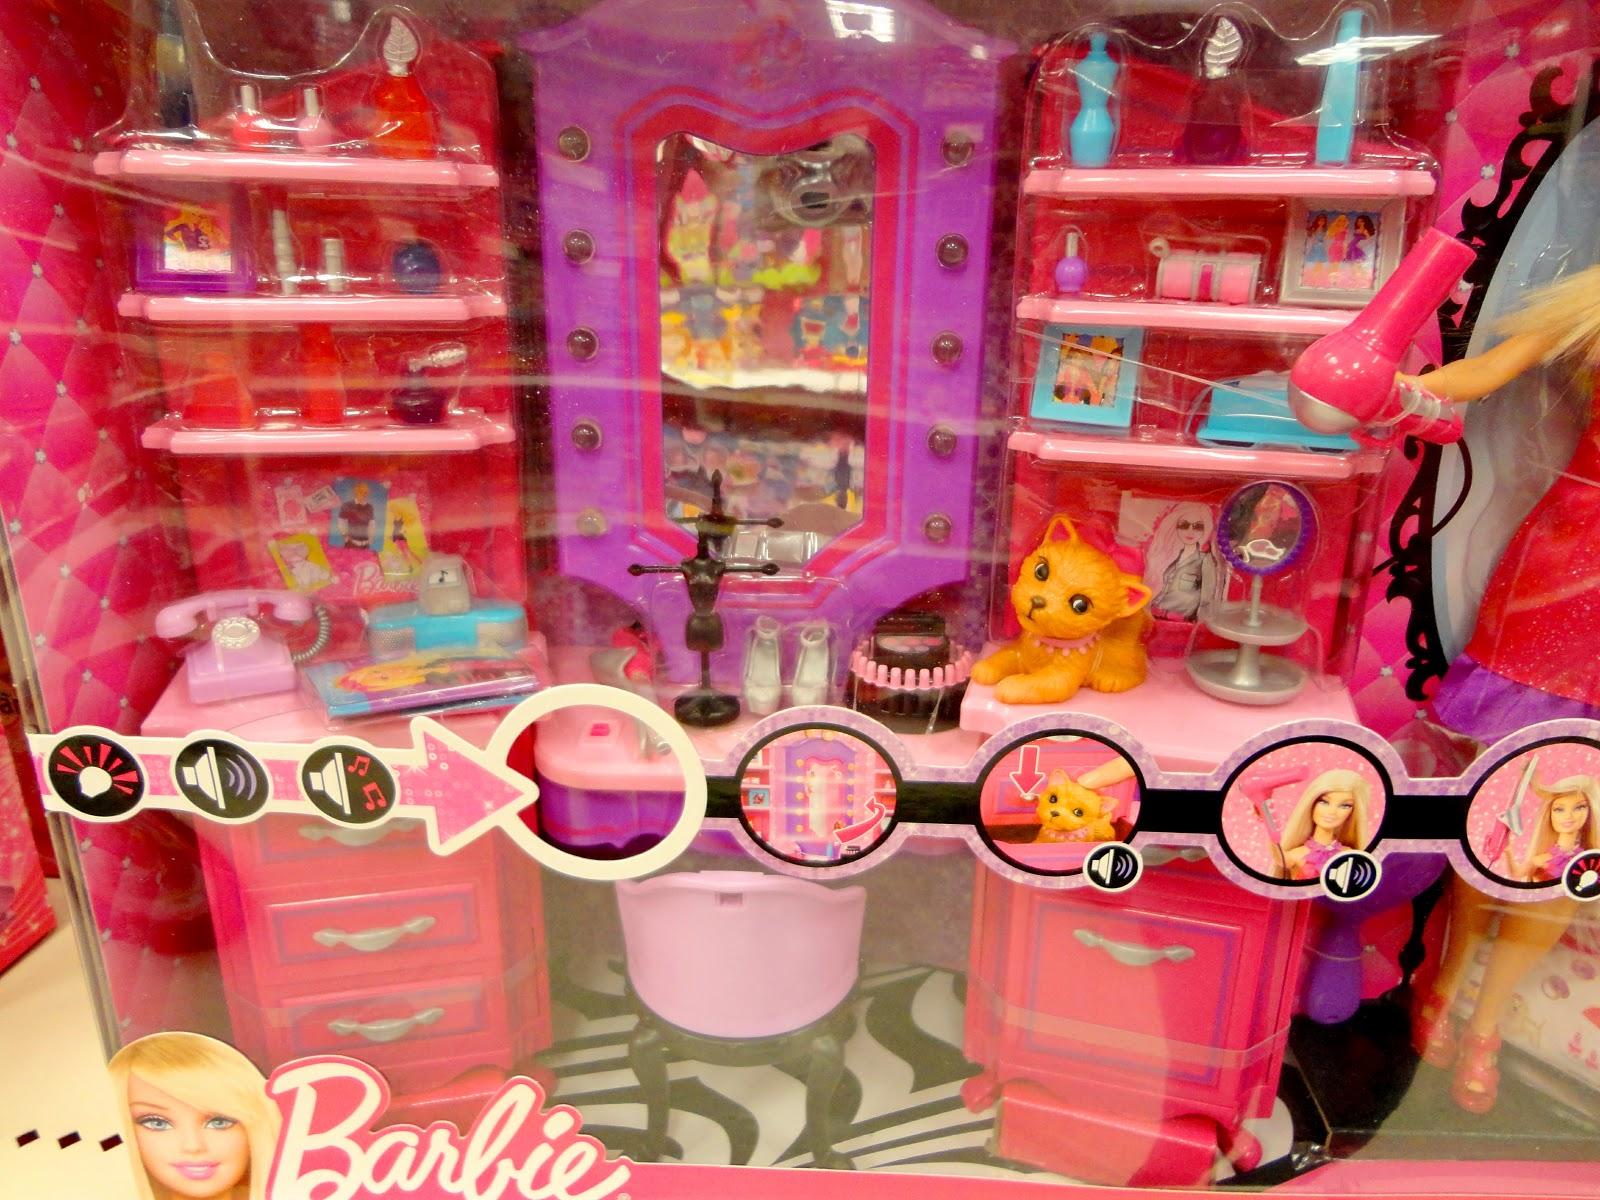 Barbie makeup mirror target makeup vidalondon for Target makeup vanity